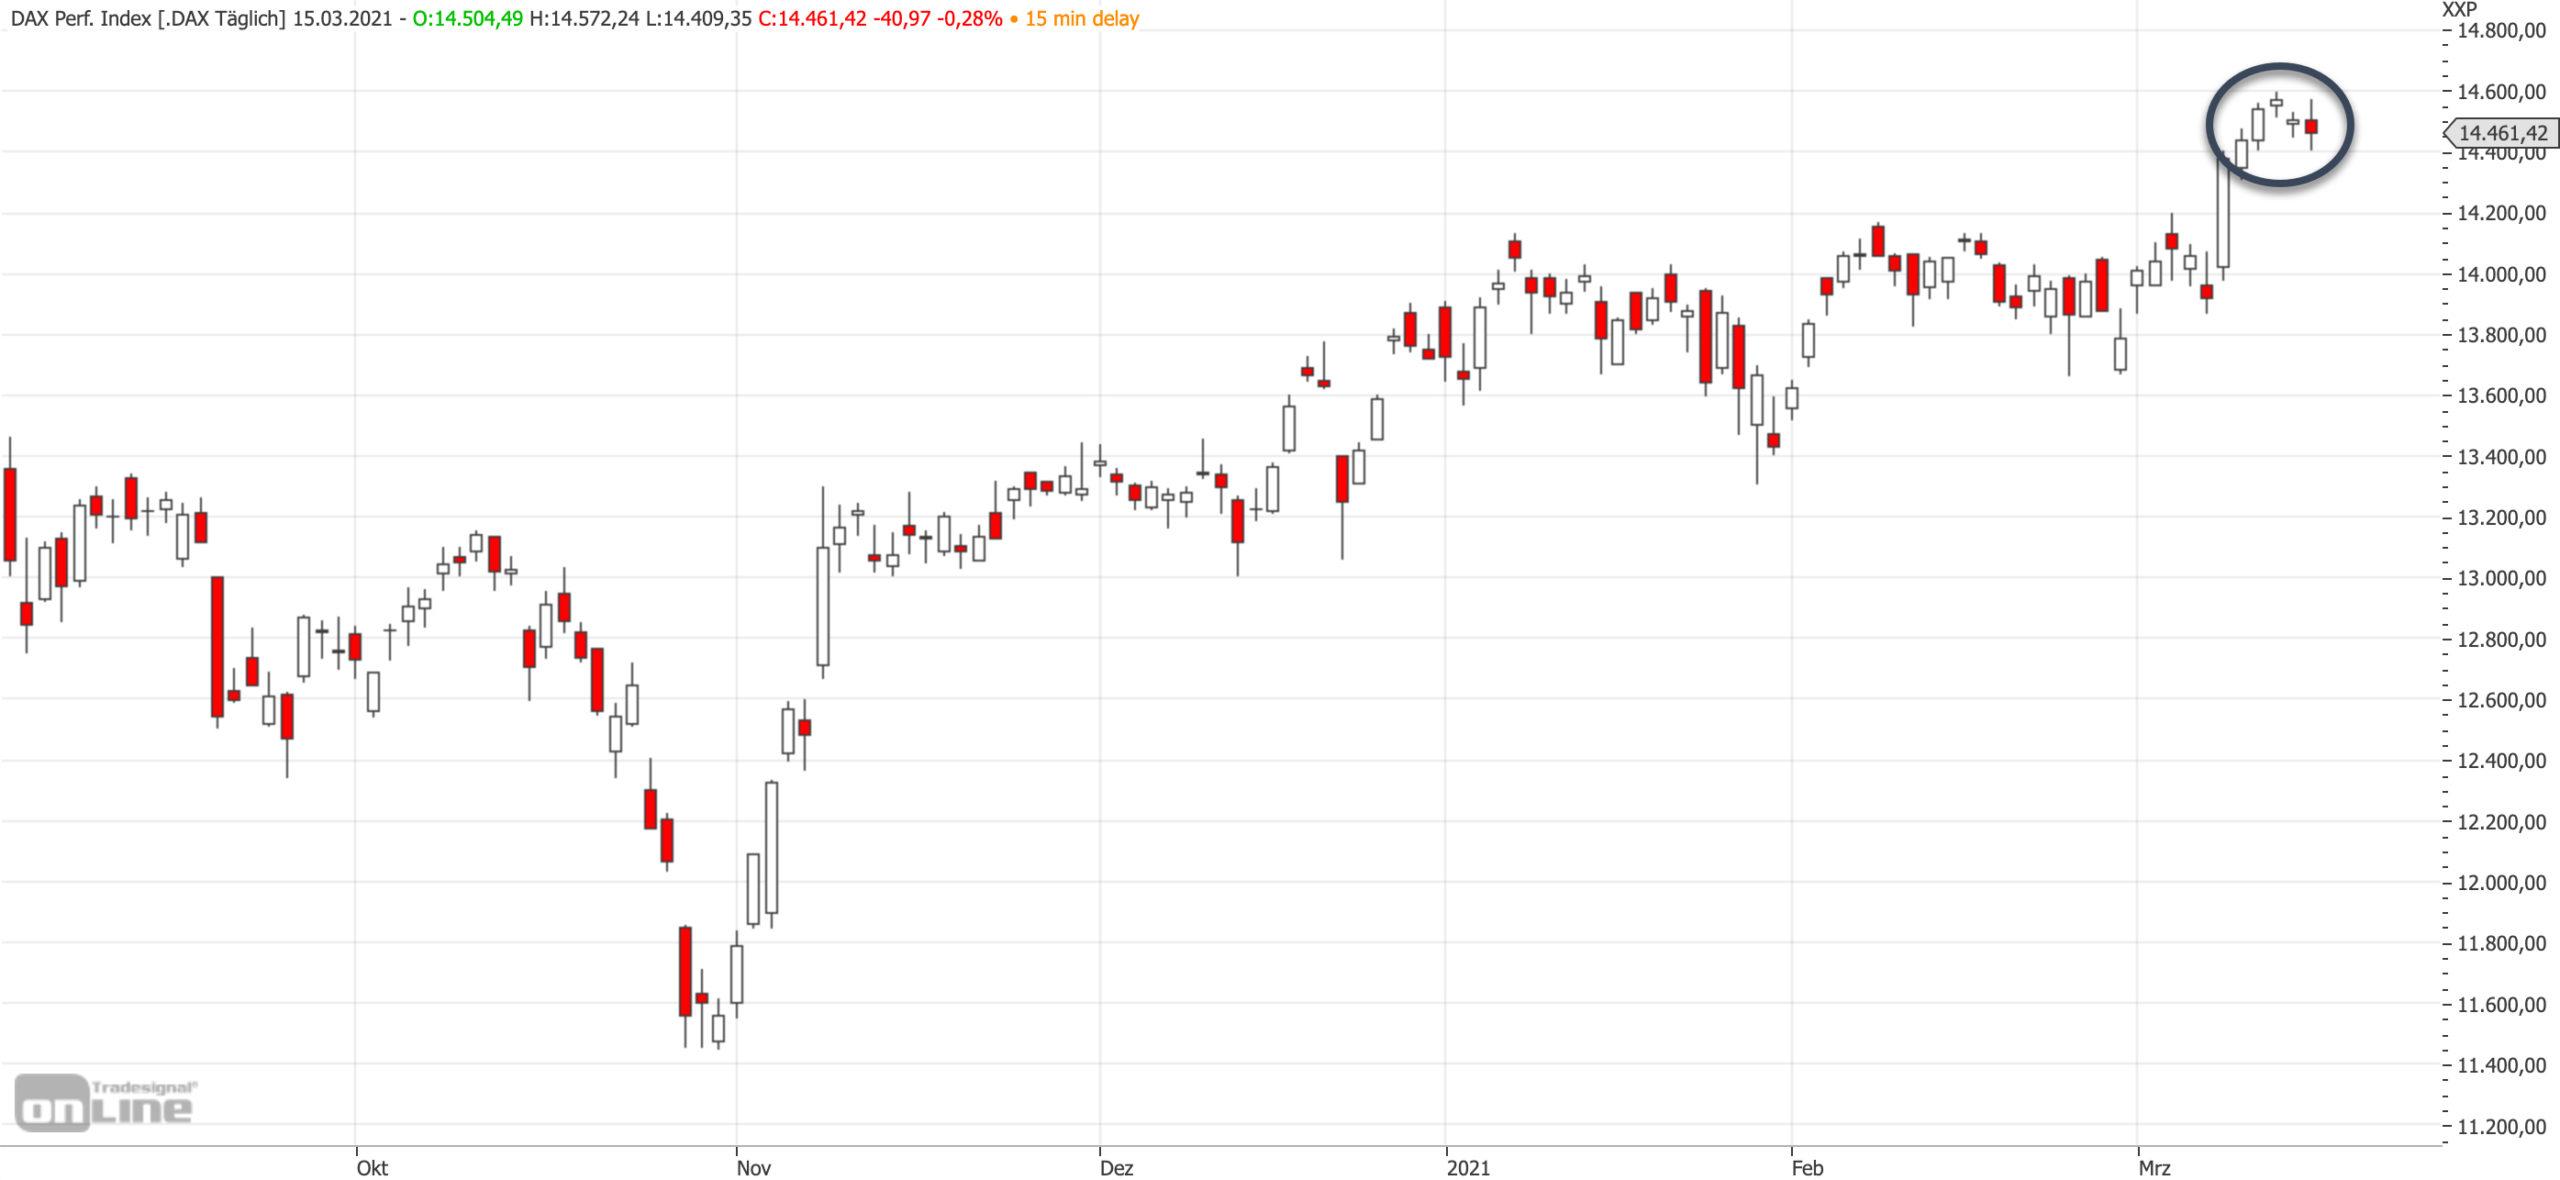 Mittelfristiger DAX-Chart am 15.03.2021